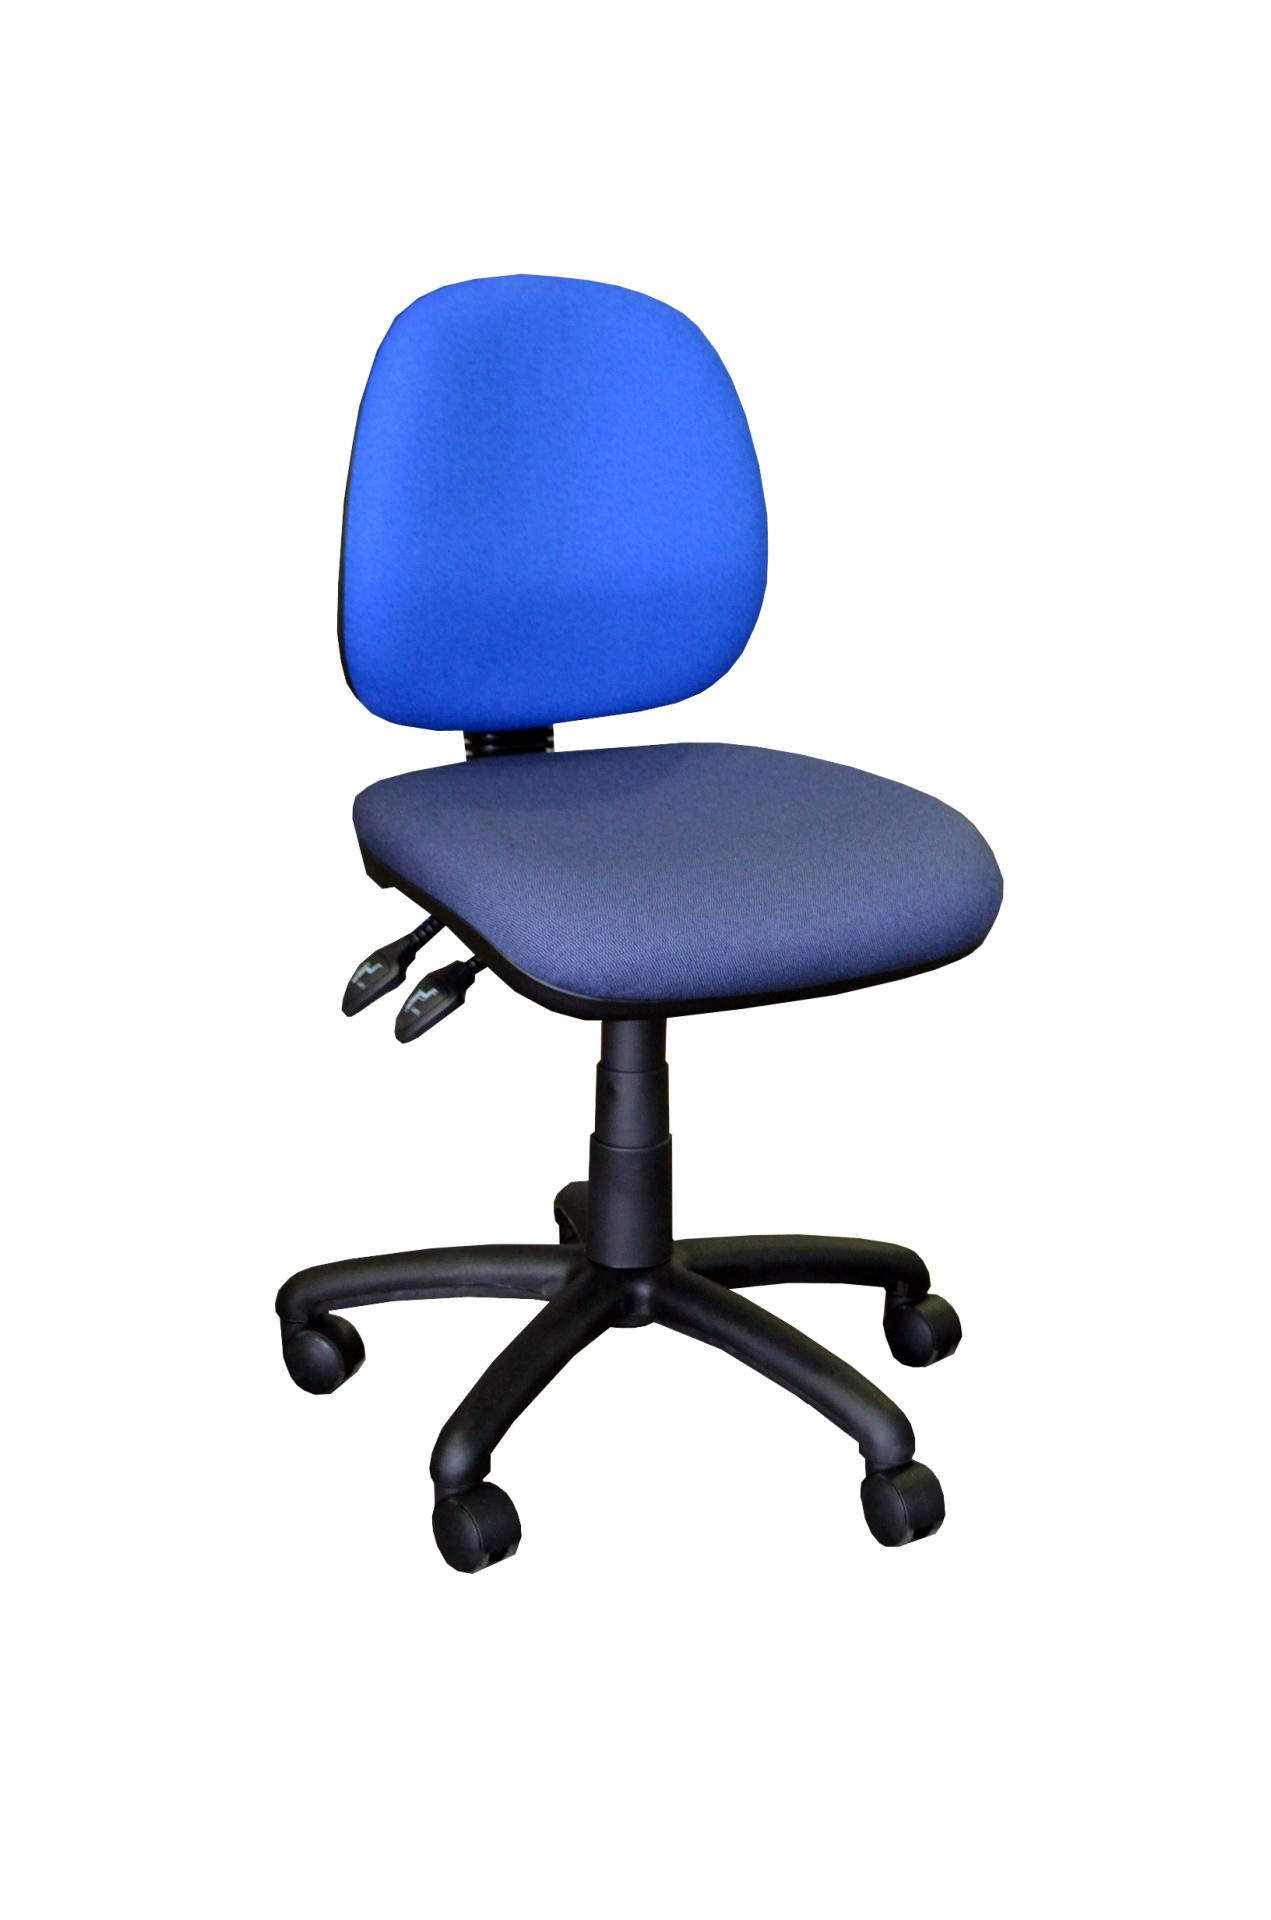 Direct Ergonomics   Sydney Office Furniture   Ergonomic Furniture   Ergonomic Seating   Executive and Task Seating   Executive Chair   Genex 600